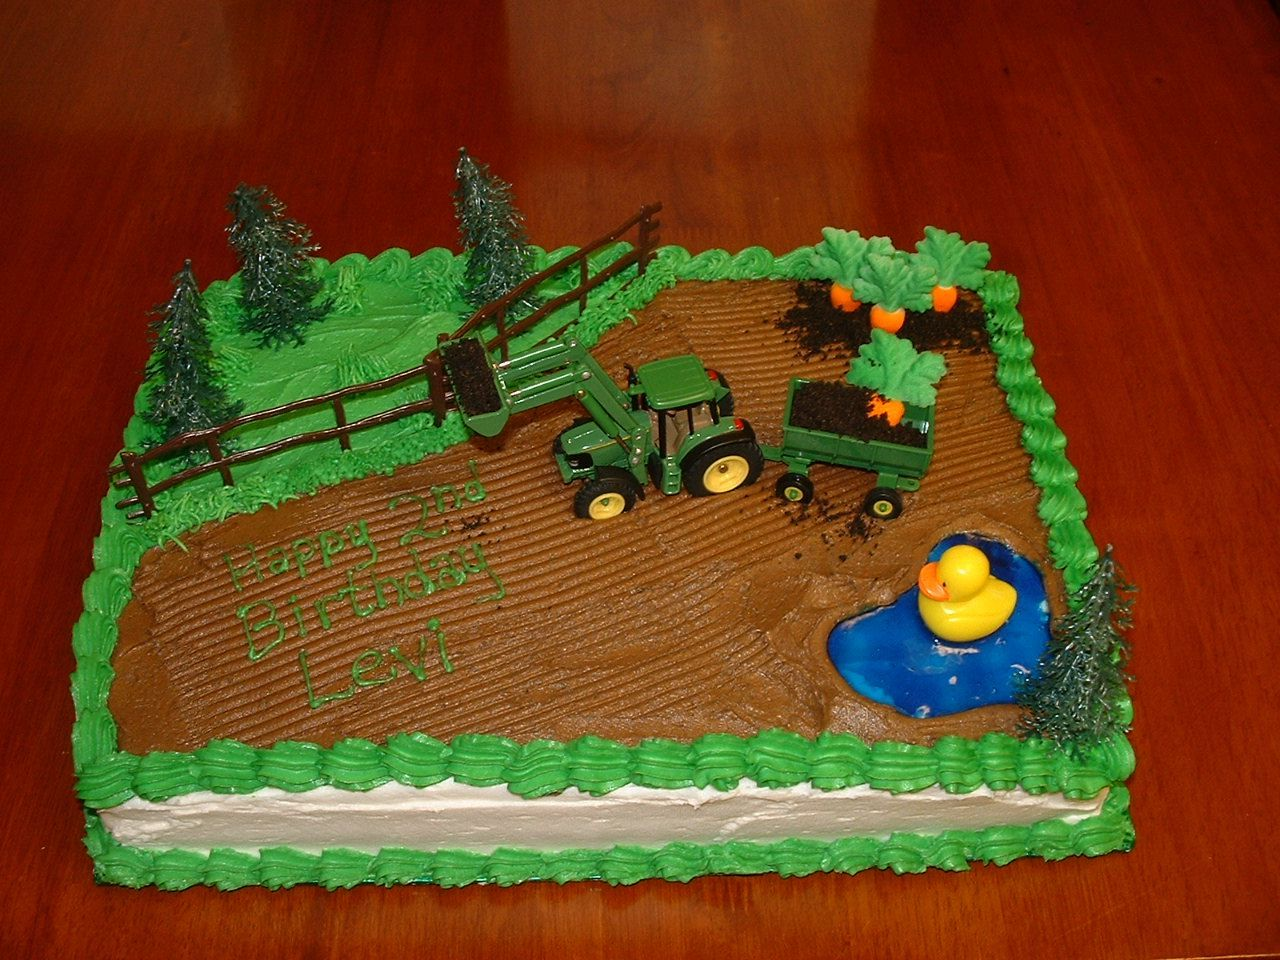 Farm Tractor Birthday Cake Torte Kindergeburtstag Traktor Geburtstagstorte Kuchen Kindergeburtstag